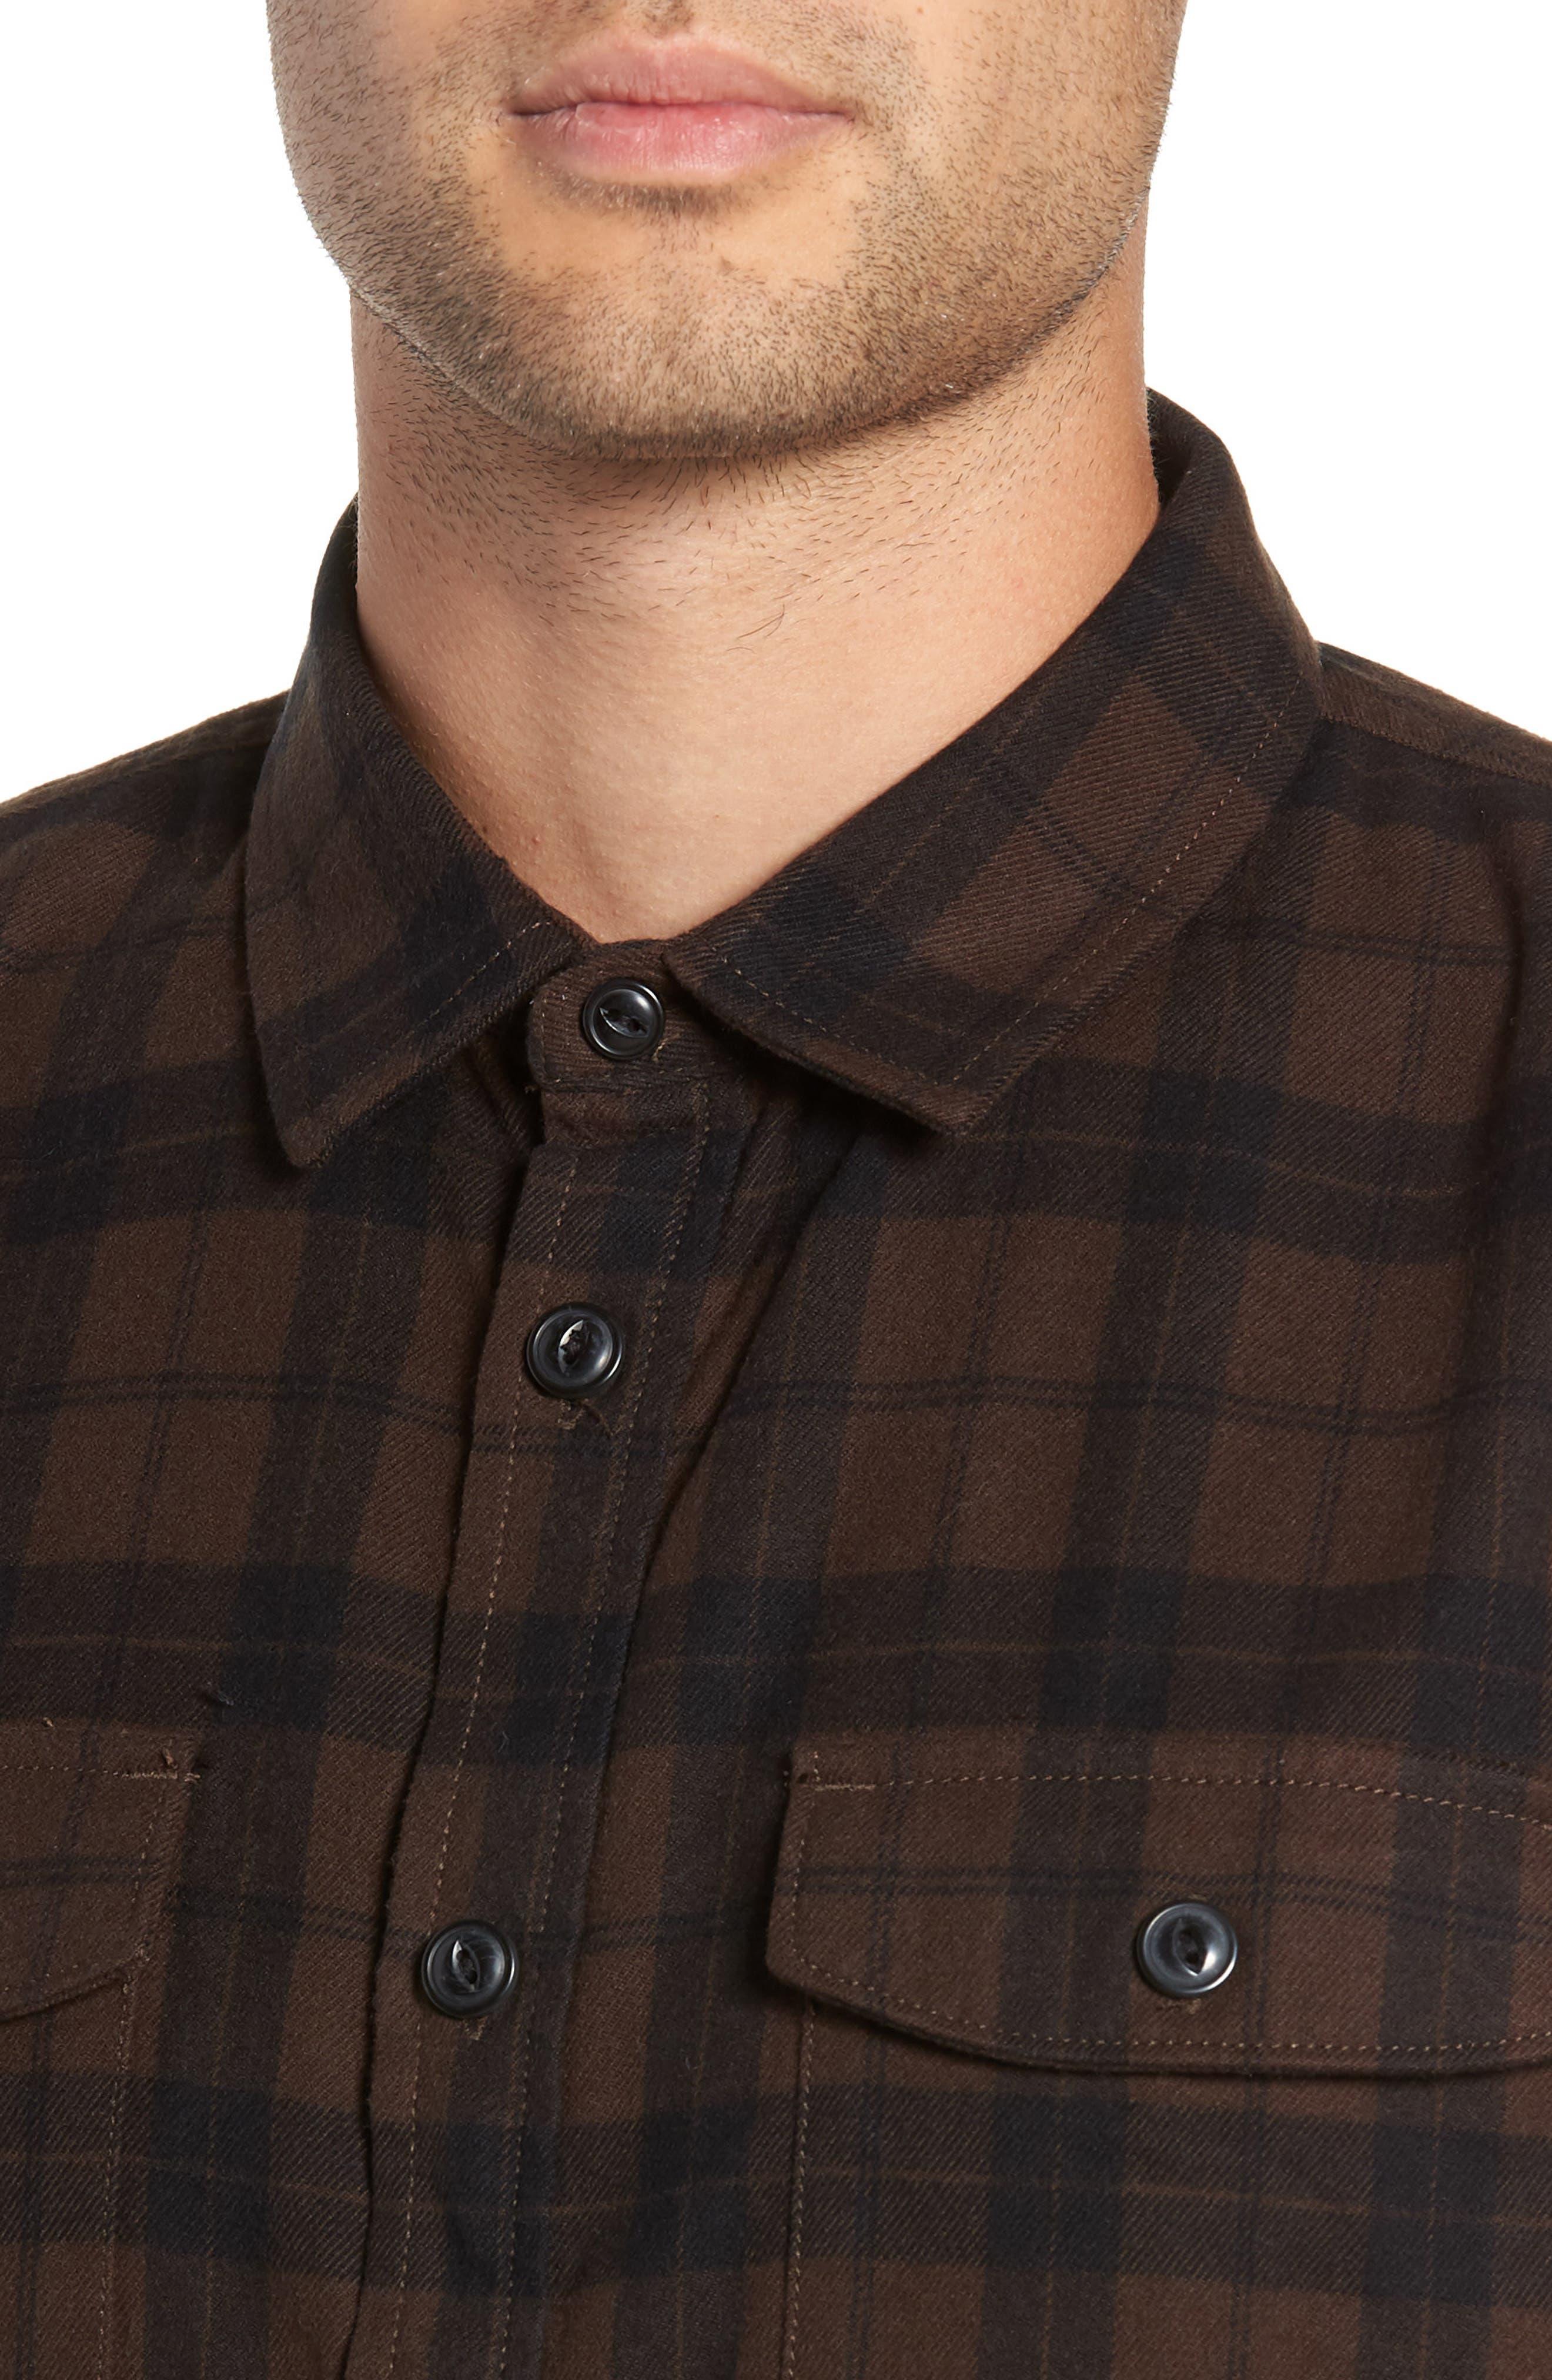 Blackstone Flannel Shirt,                             Alternate thumbnail 2, color,                             DEMITASSE/ BLACK